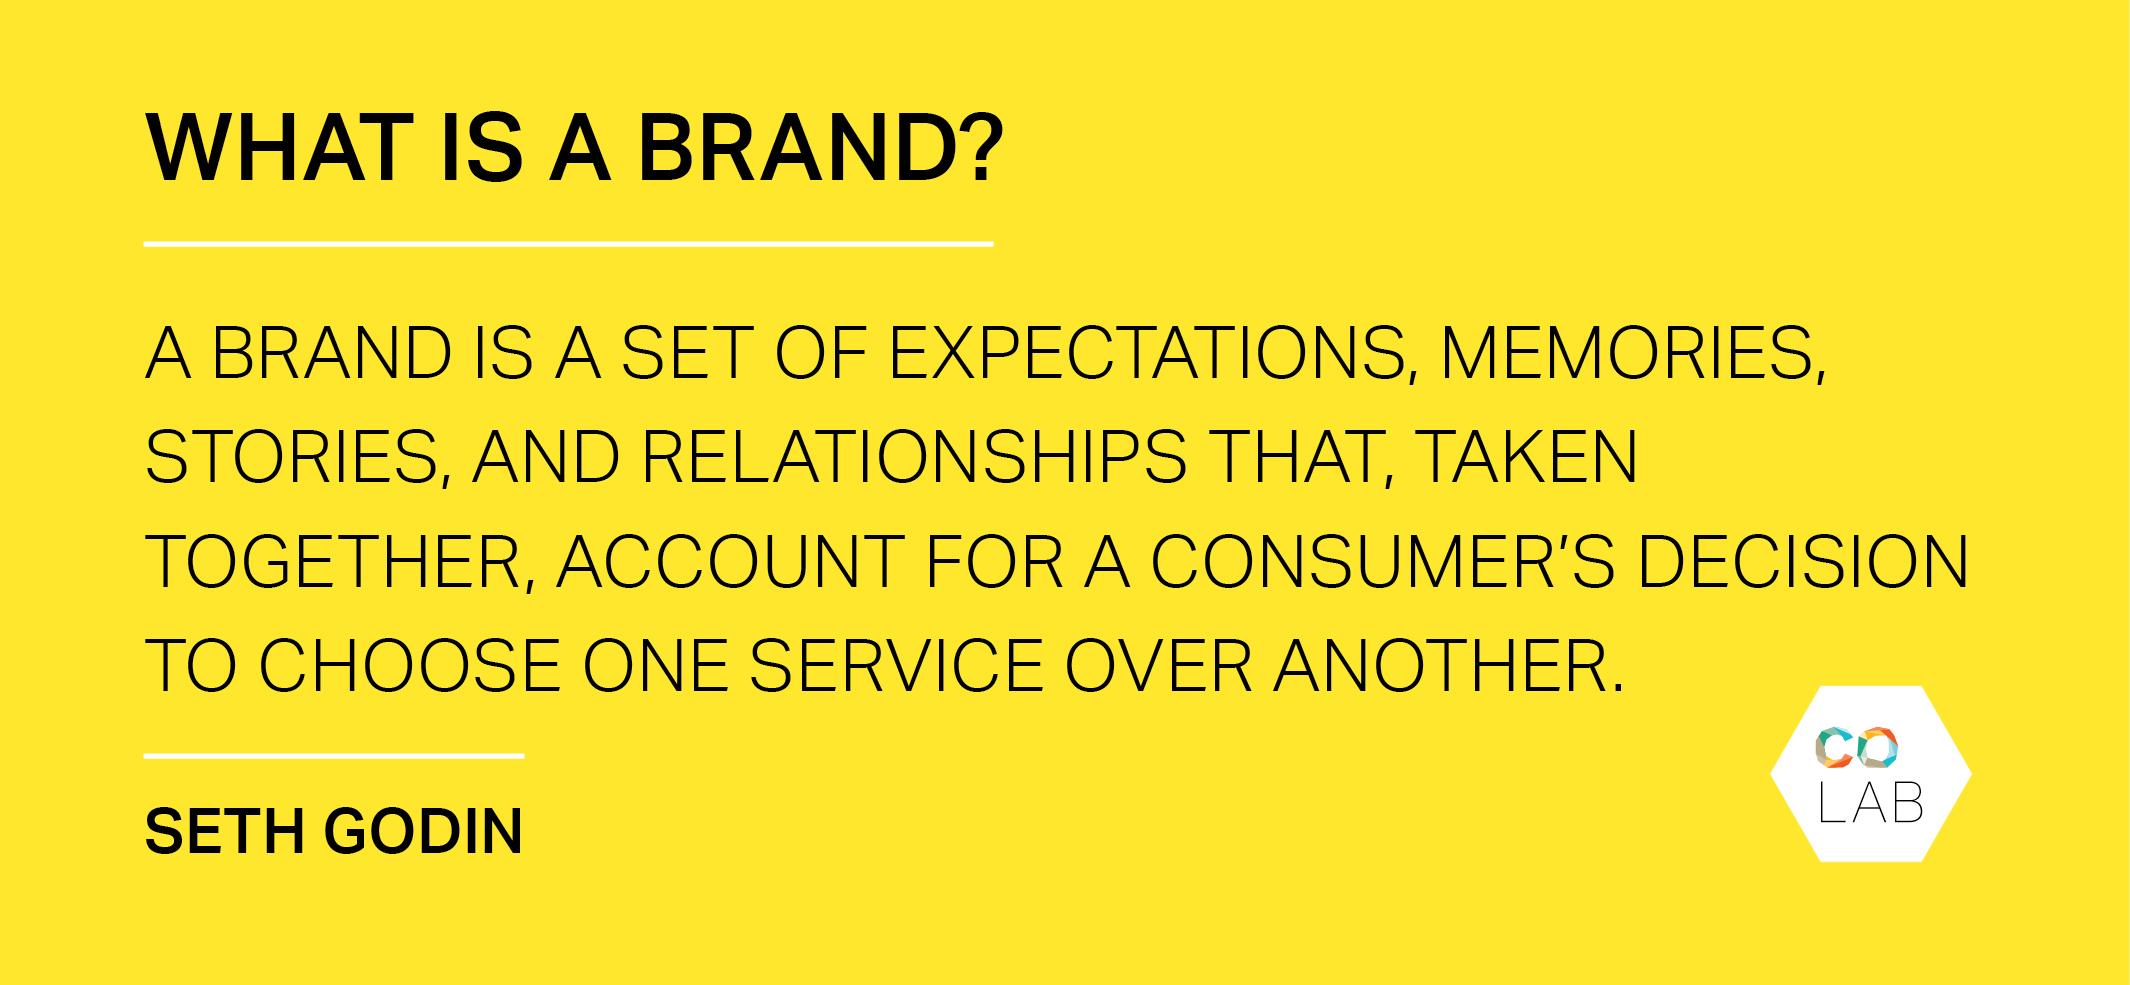 Seth Godin's quote on branding